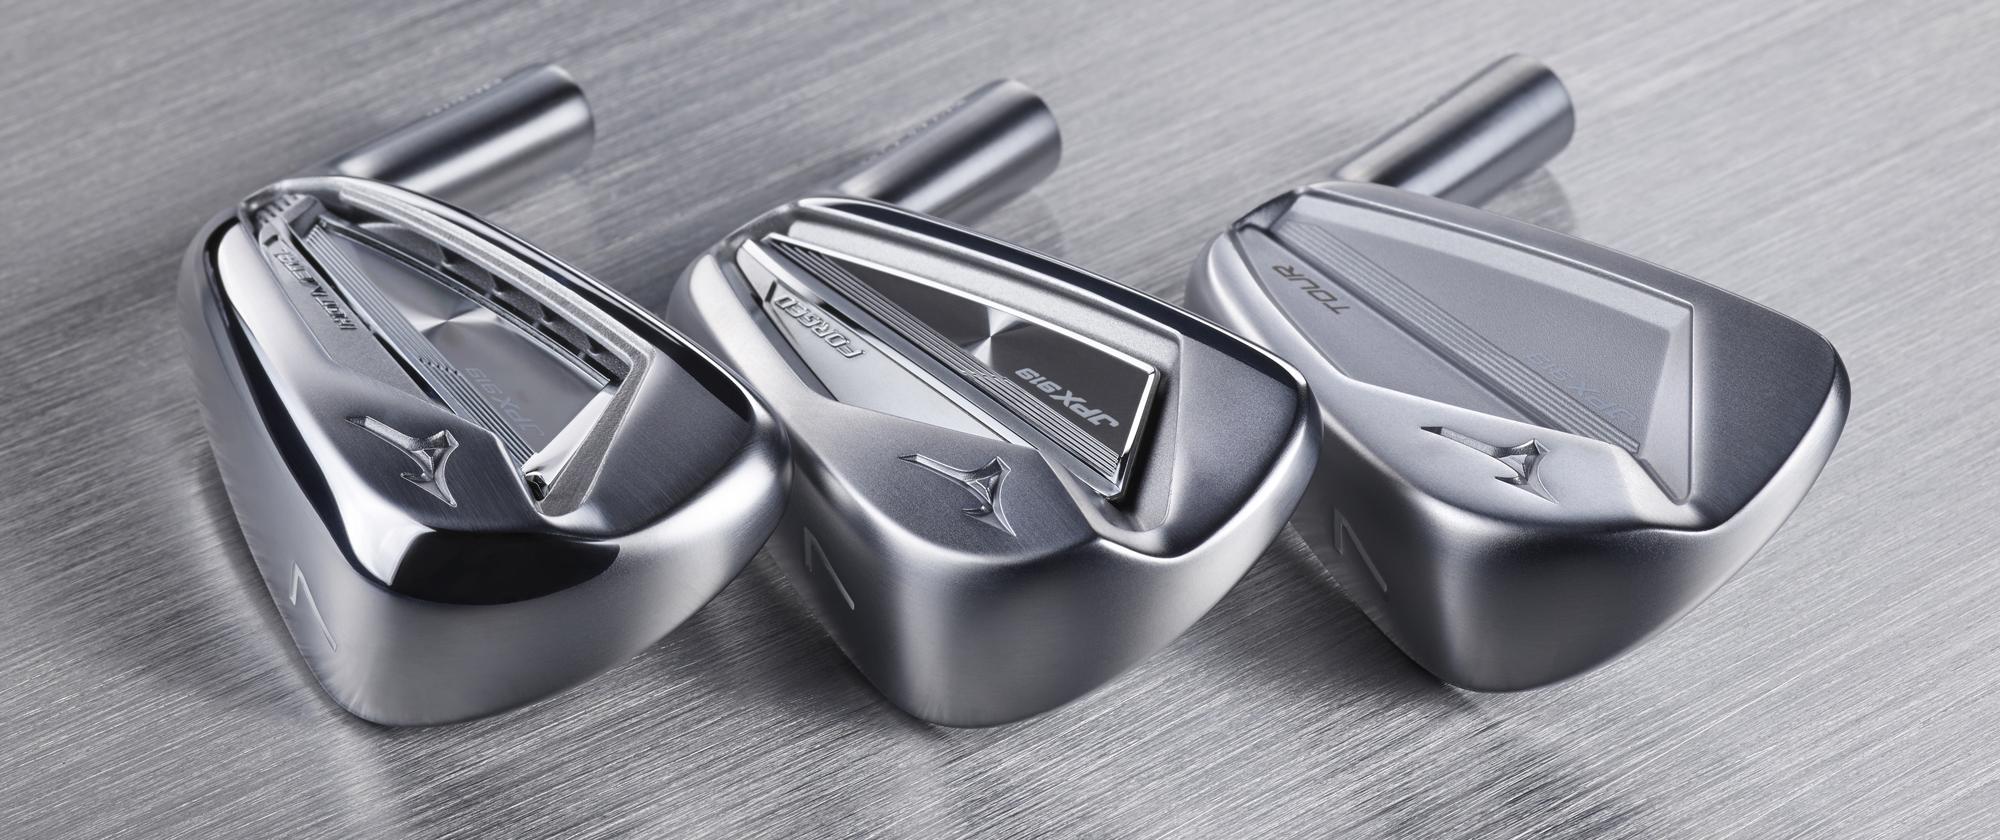 106cb1becd3 Mizuno JPX919 iron sets - custom assembly schedule - Mizuno Golf Europe